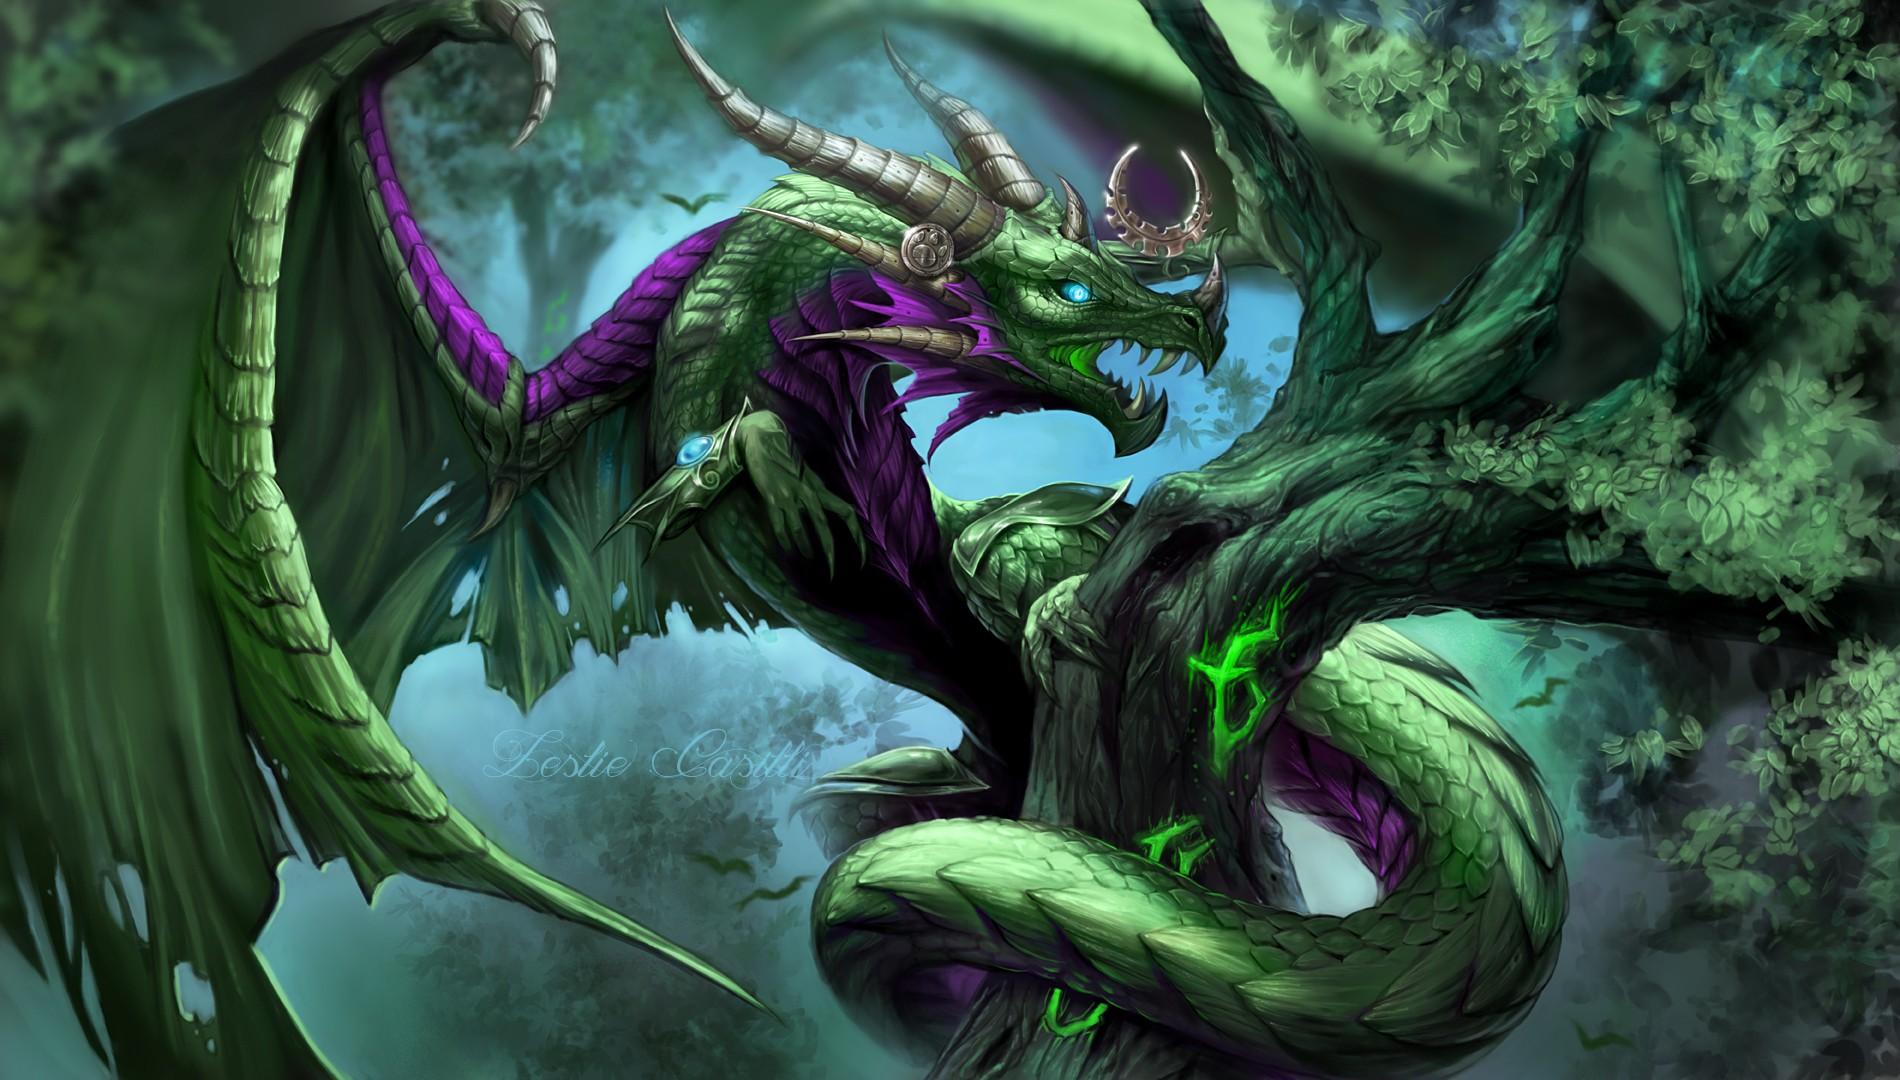 Wallpaper : illustration, World of Warcraft, dragon